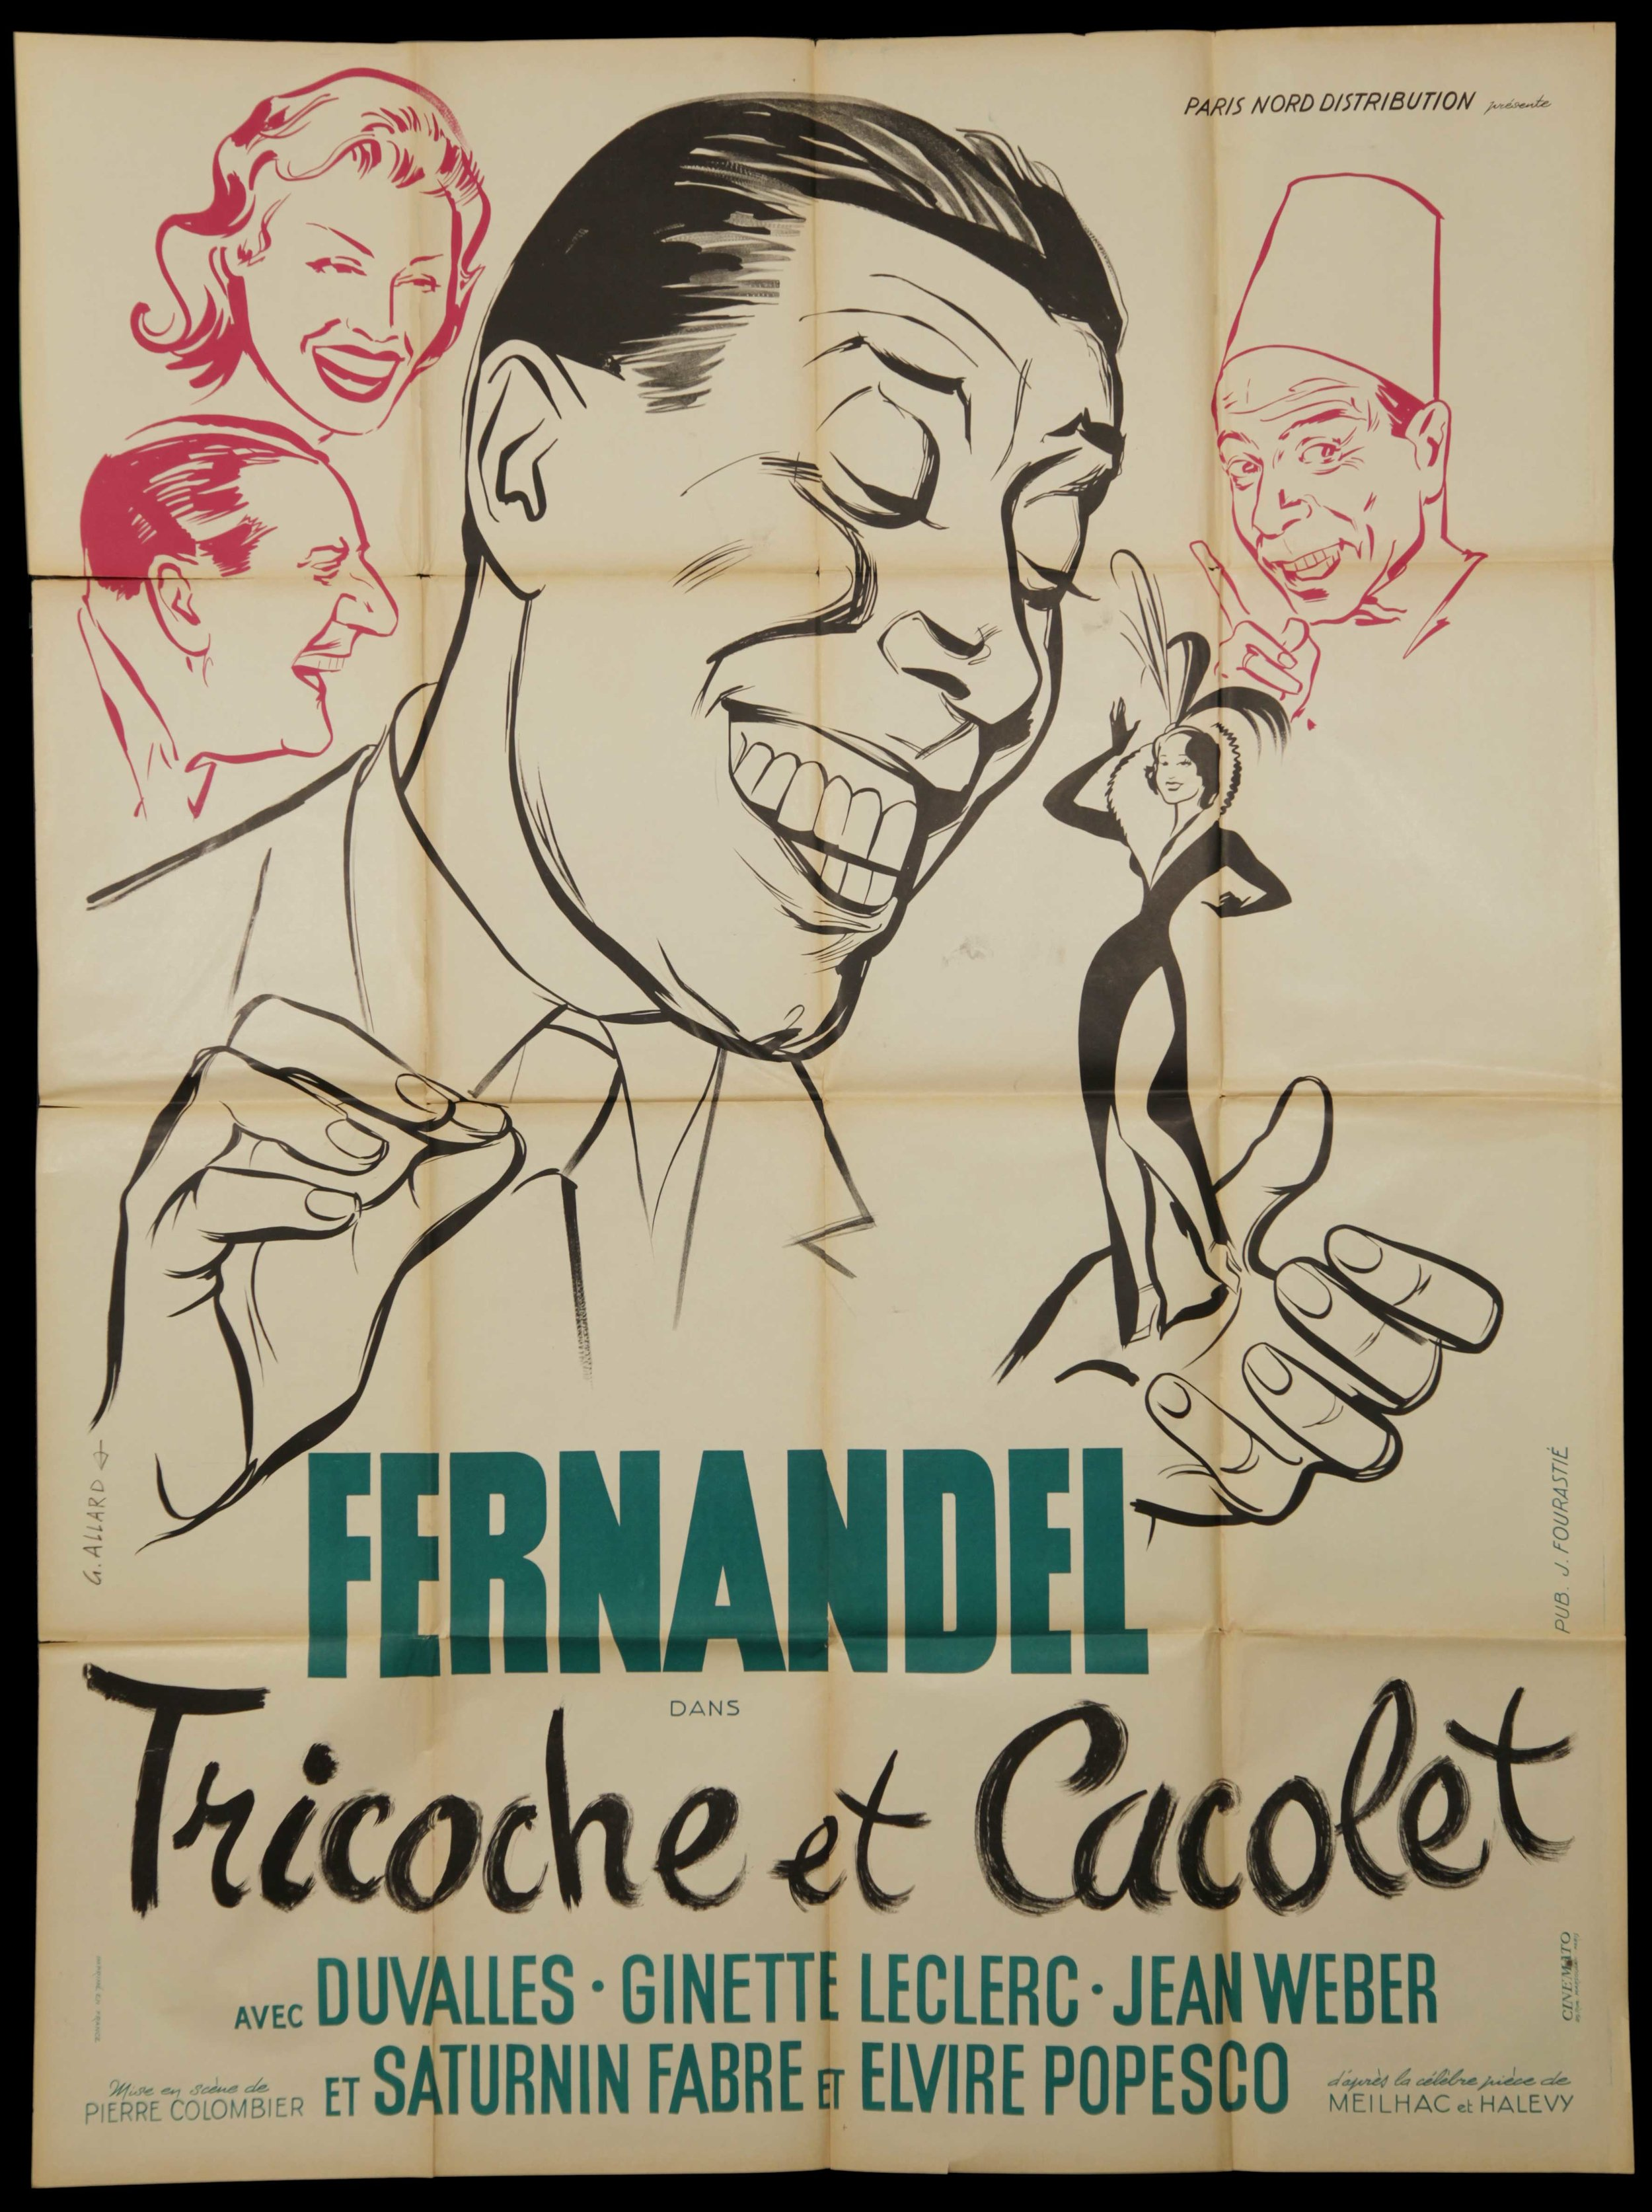 Fernadel in Tricoch Et Cacolet (1938)